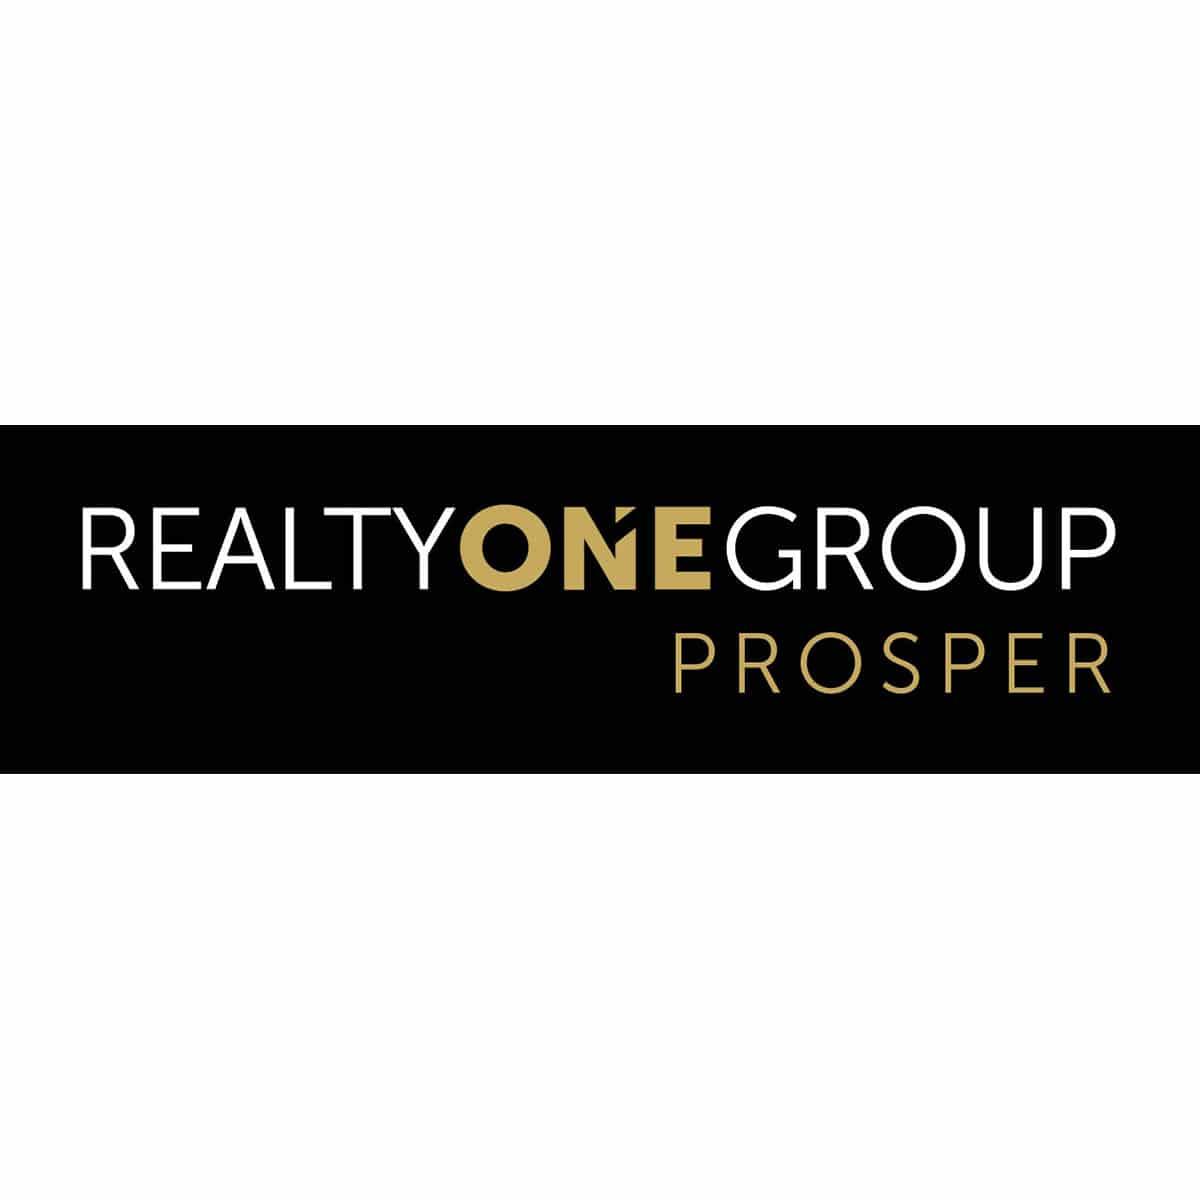 Realty One Group Prosper